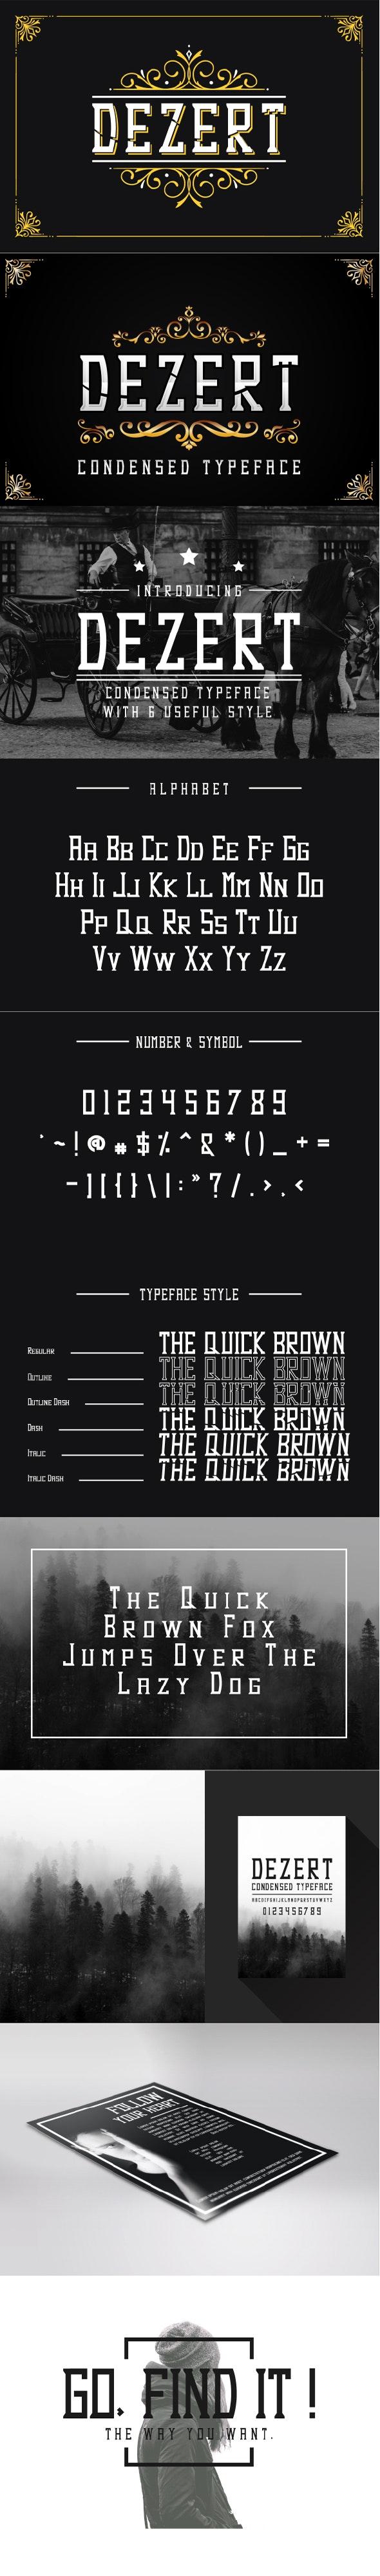 Dezert - Serif Blackletter Font - Old English Decorative